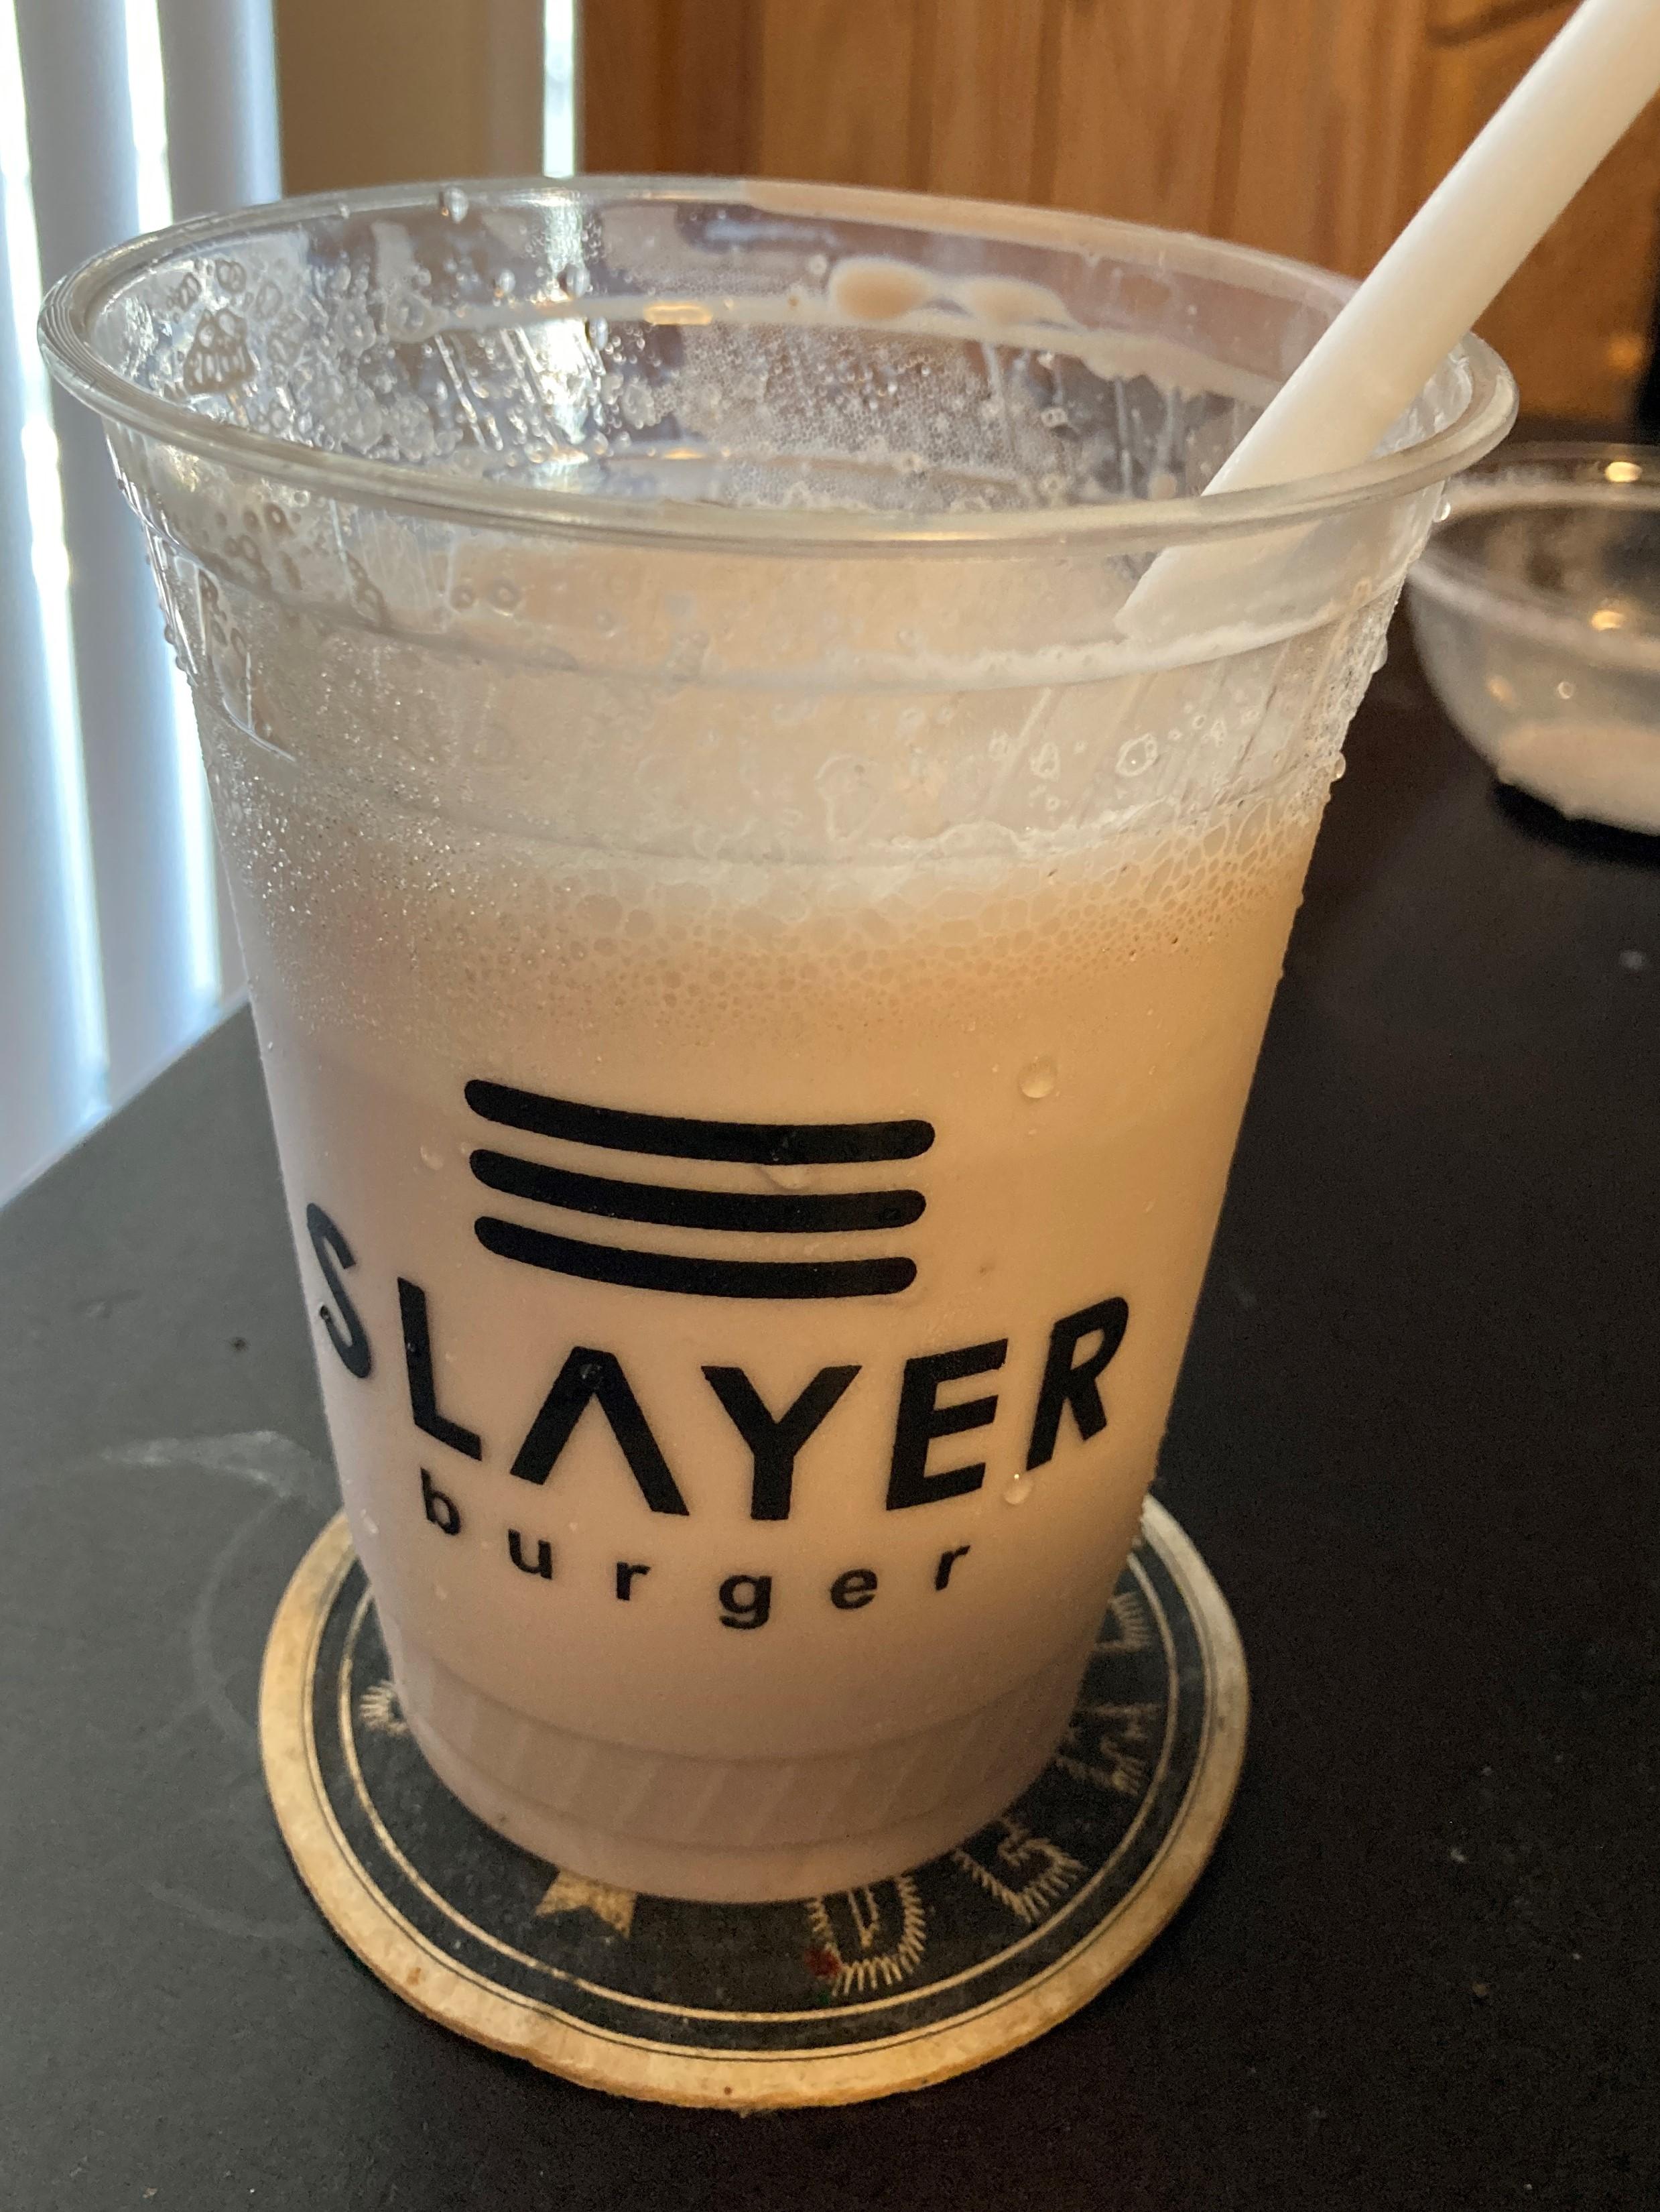 slayer_burger_milkshake (5)